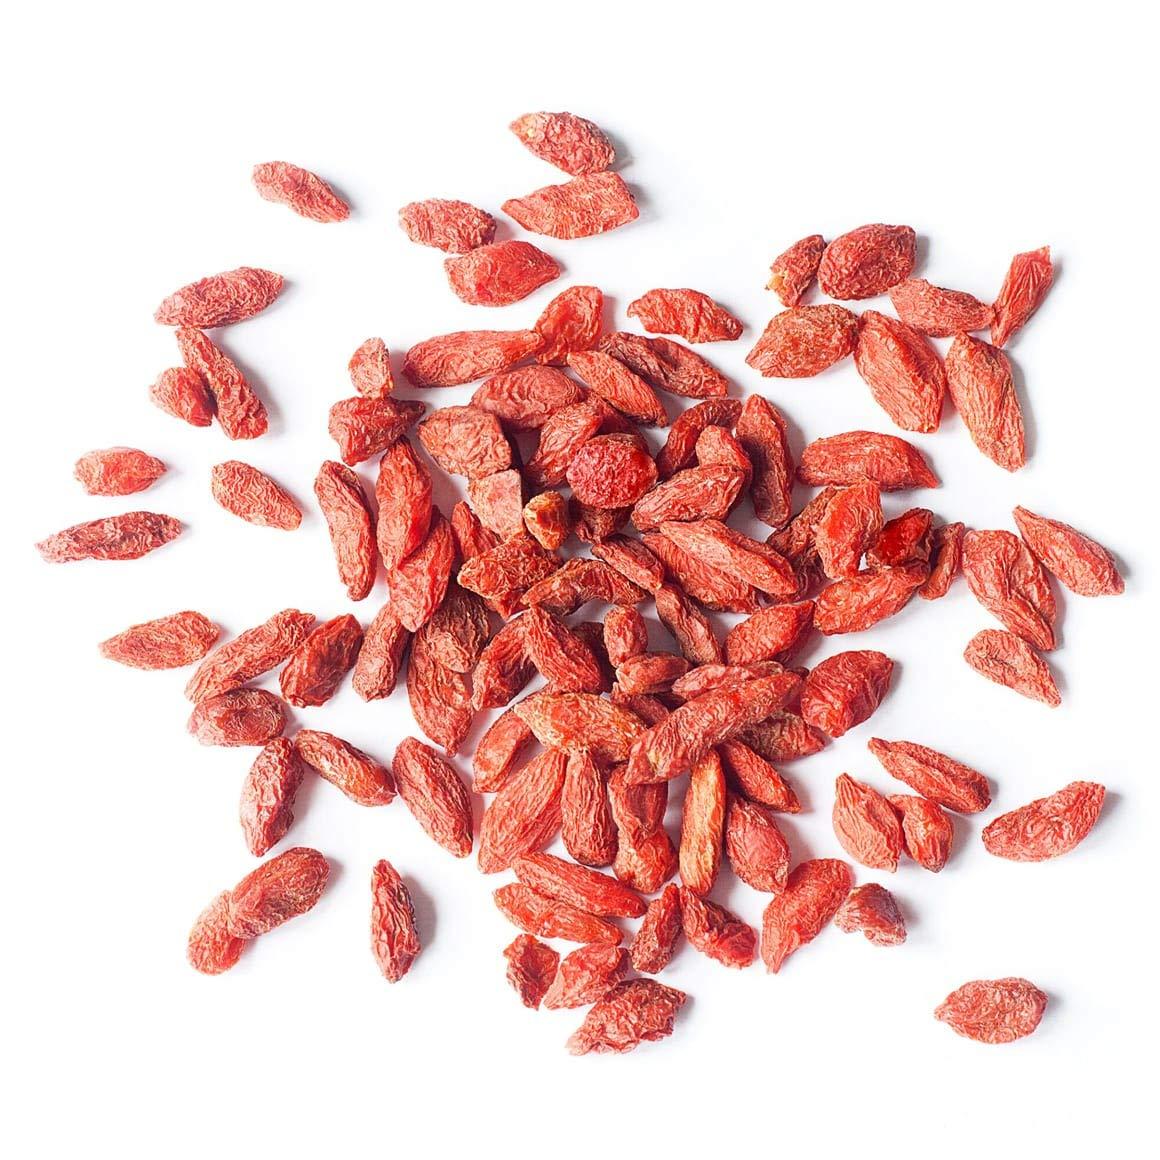 Organic Goji Berries 28 Pounds Sun Dried Large And Juicy Non Gmo Raw Vegan Bulk Amazon Com Grocery Gourmet Food